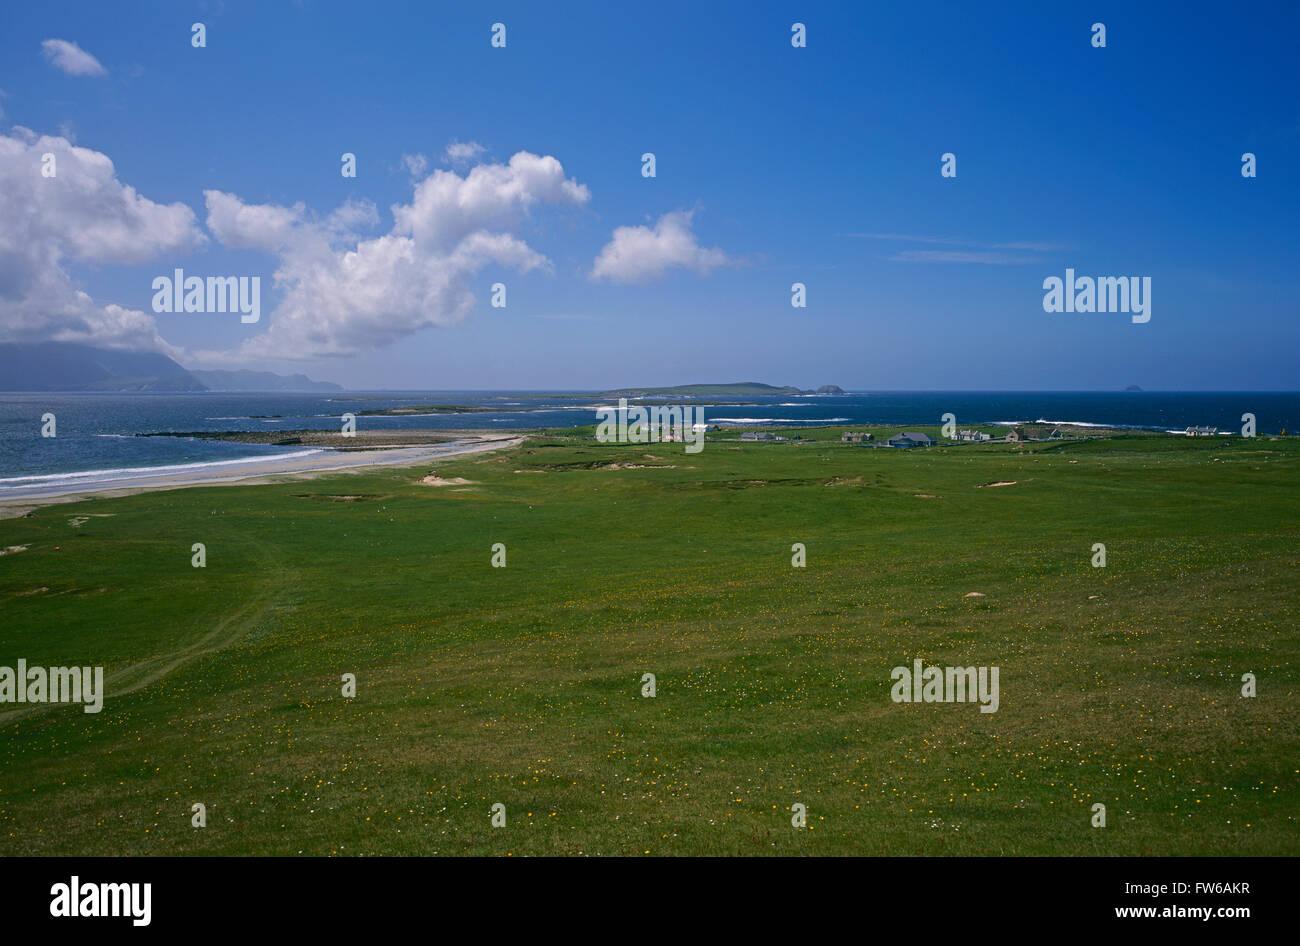 Achill Island from Belmullet Peninsula, County Mayo, Ireland - Stock Image